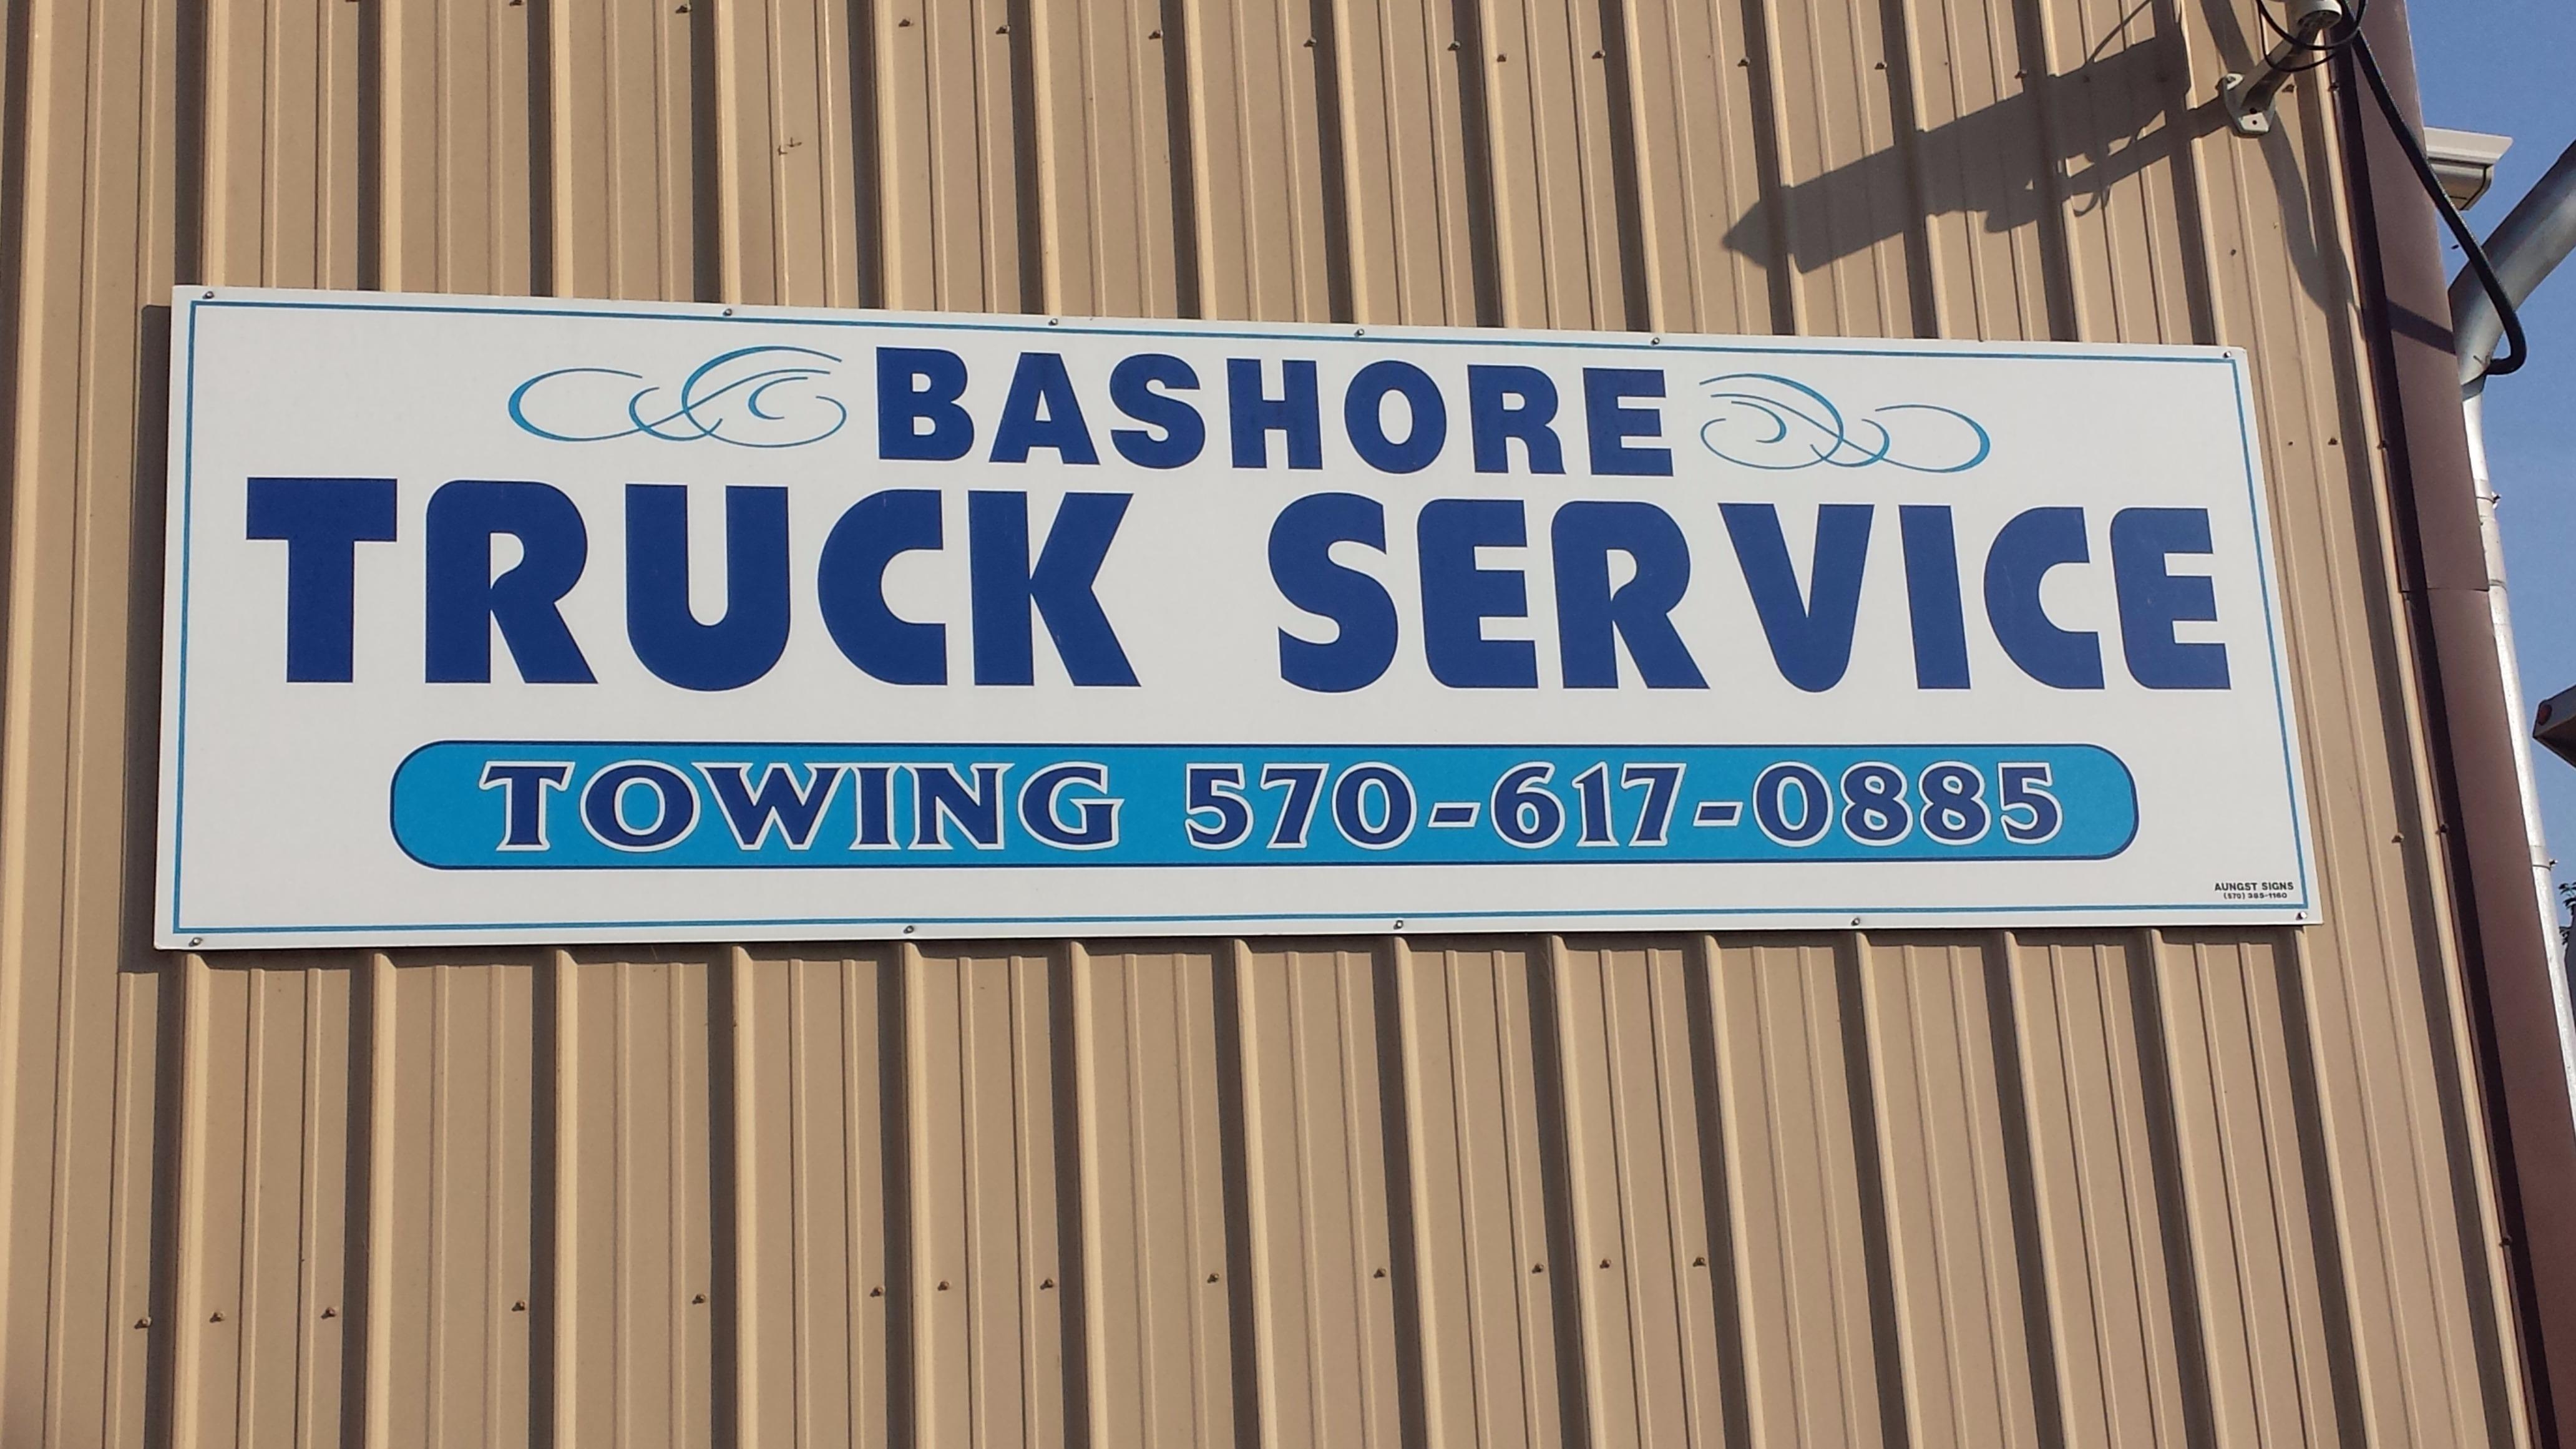 Bashore Truck service image 0